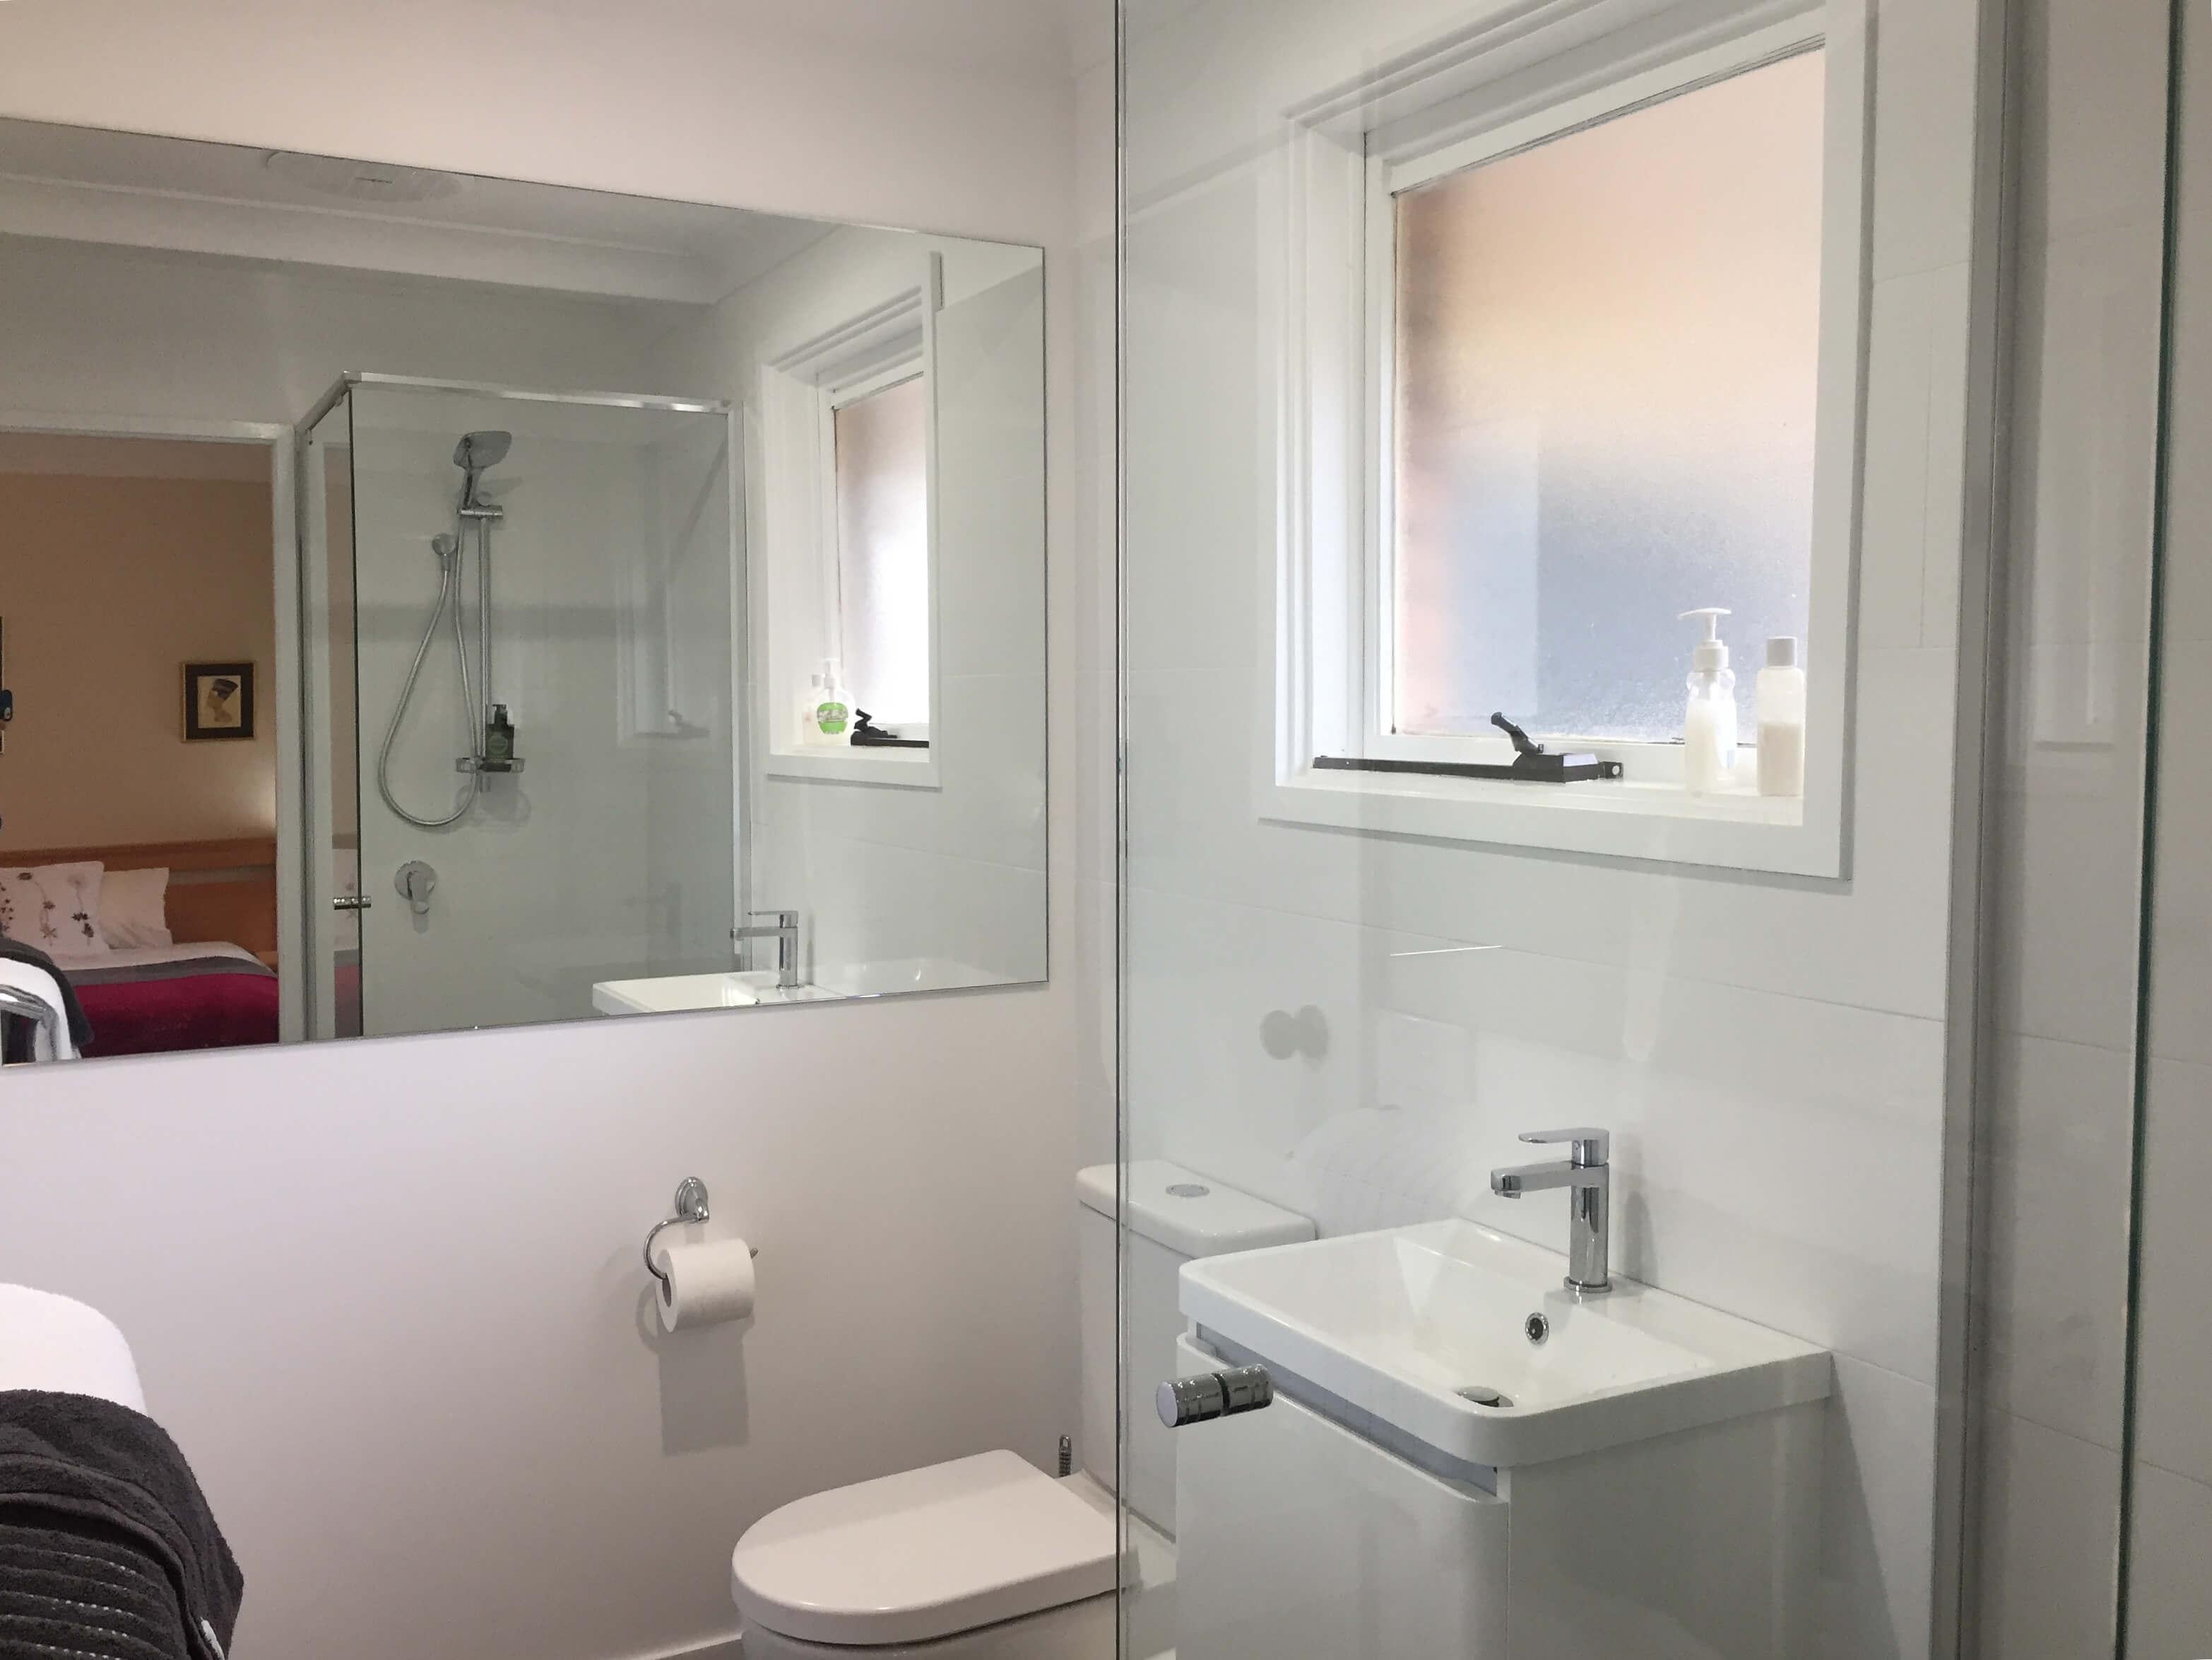 Wanderers Retreat Bathroom 1